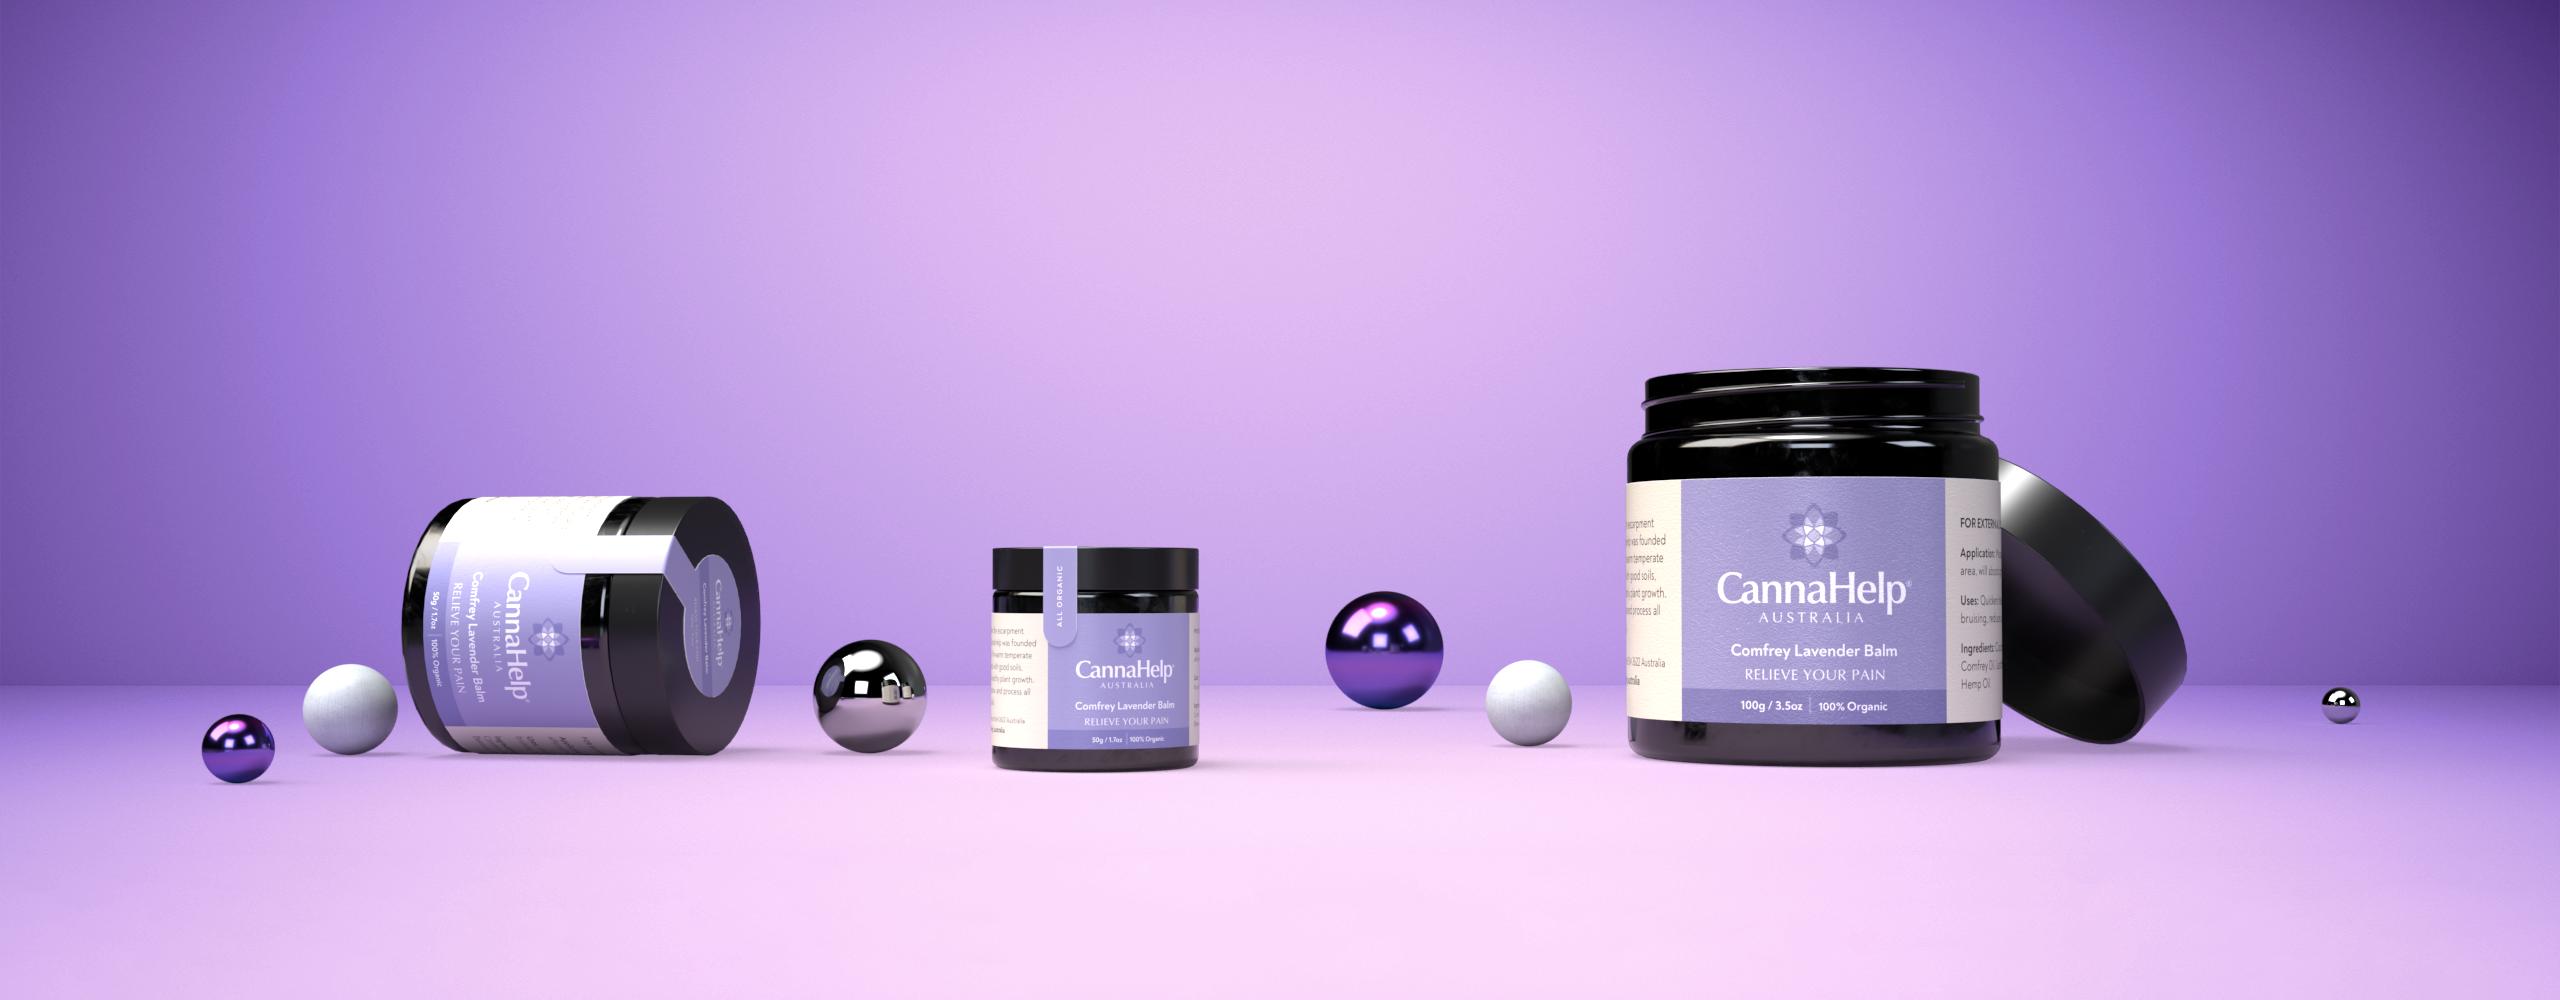 3. CannaHelp_HempLav Banner Spheres-Front Center